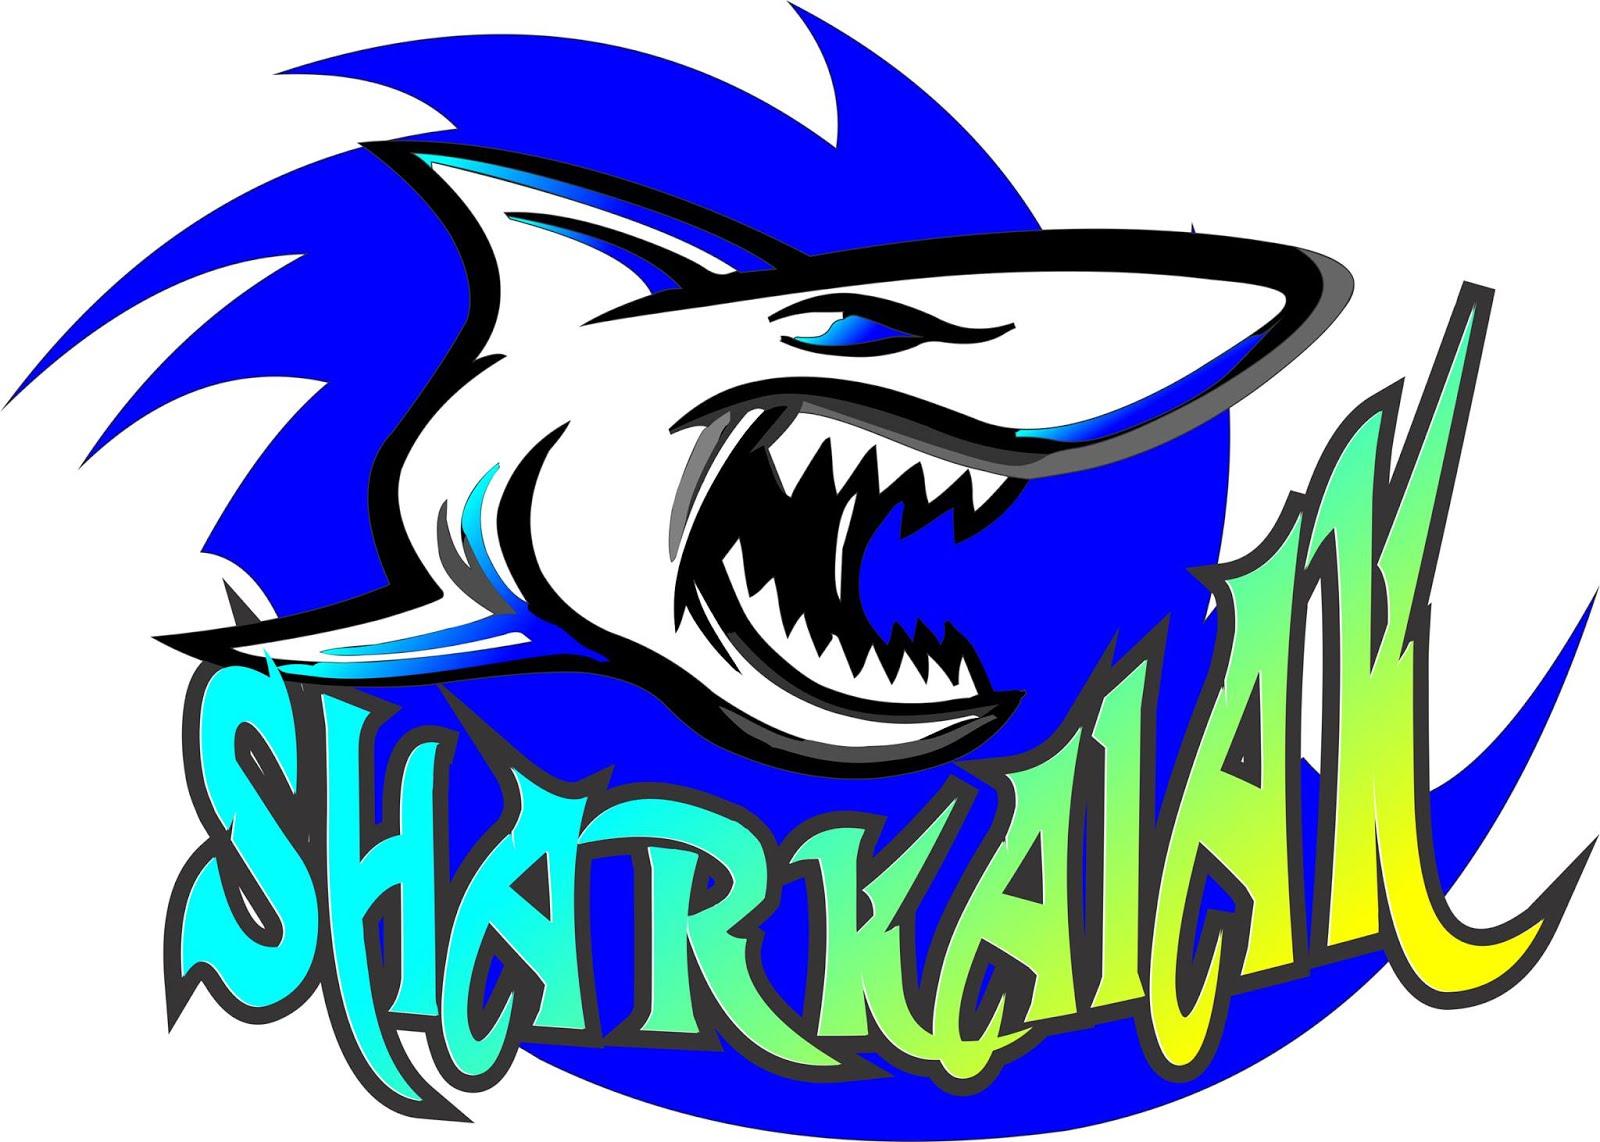 Sharkaiak